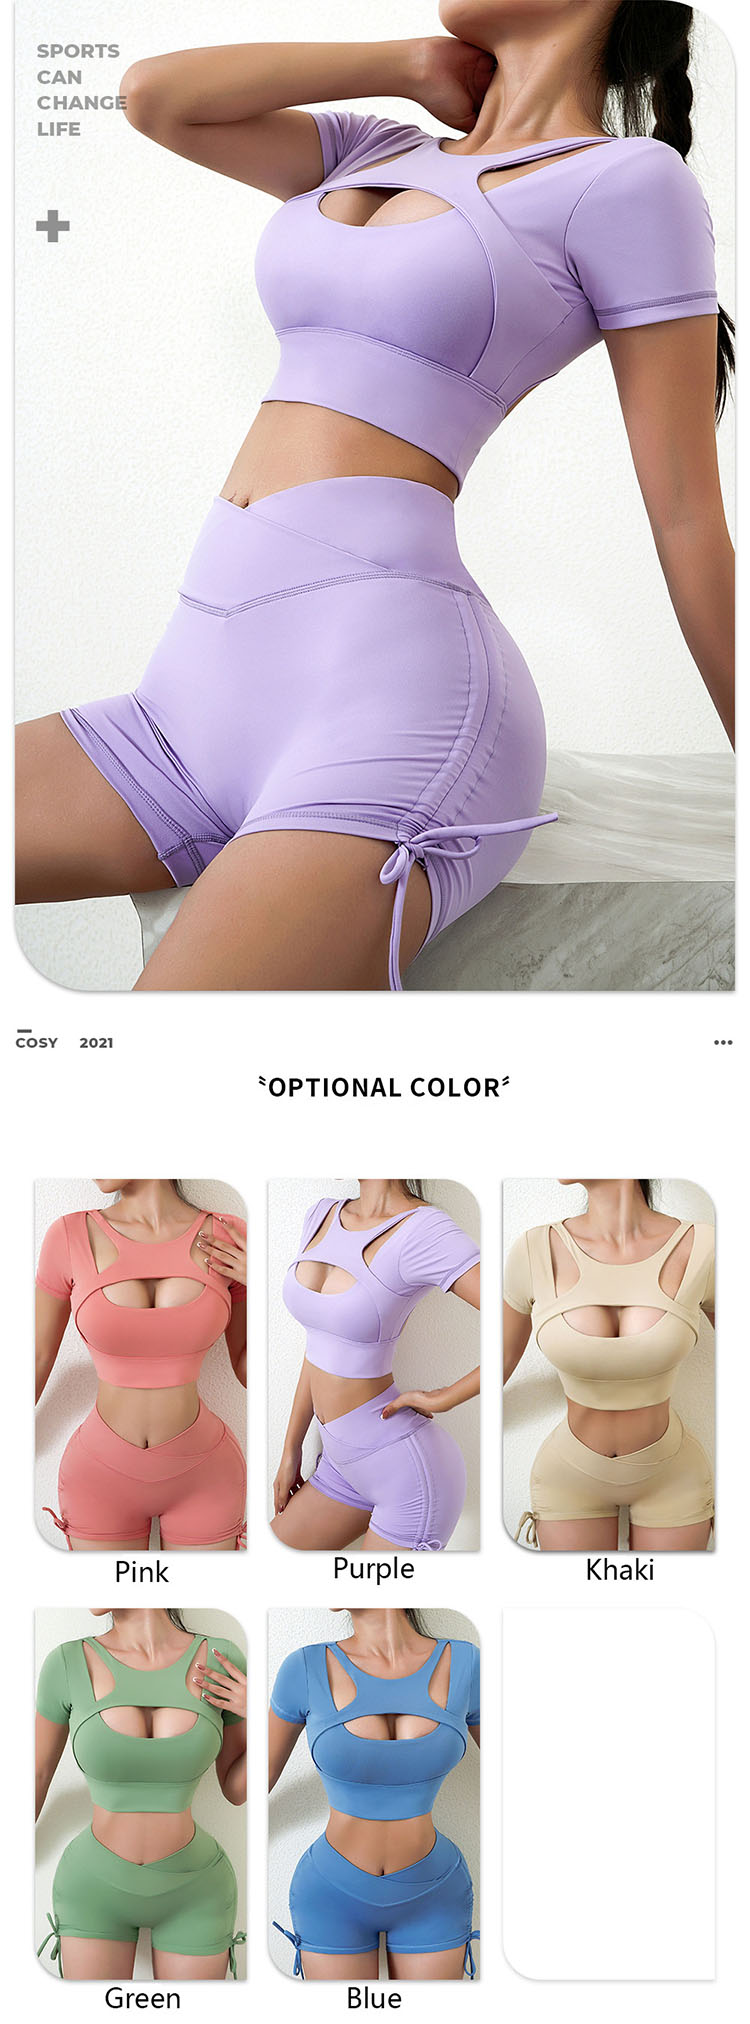 The Khaki gym leggings to enhance the design of this single piece.